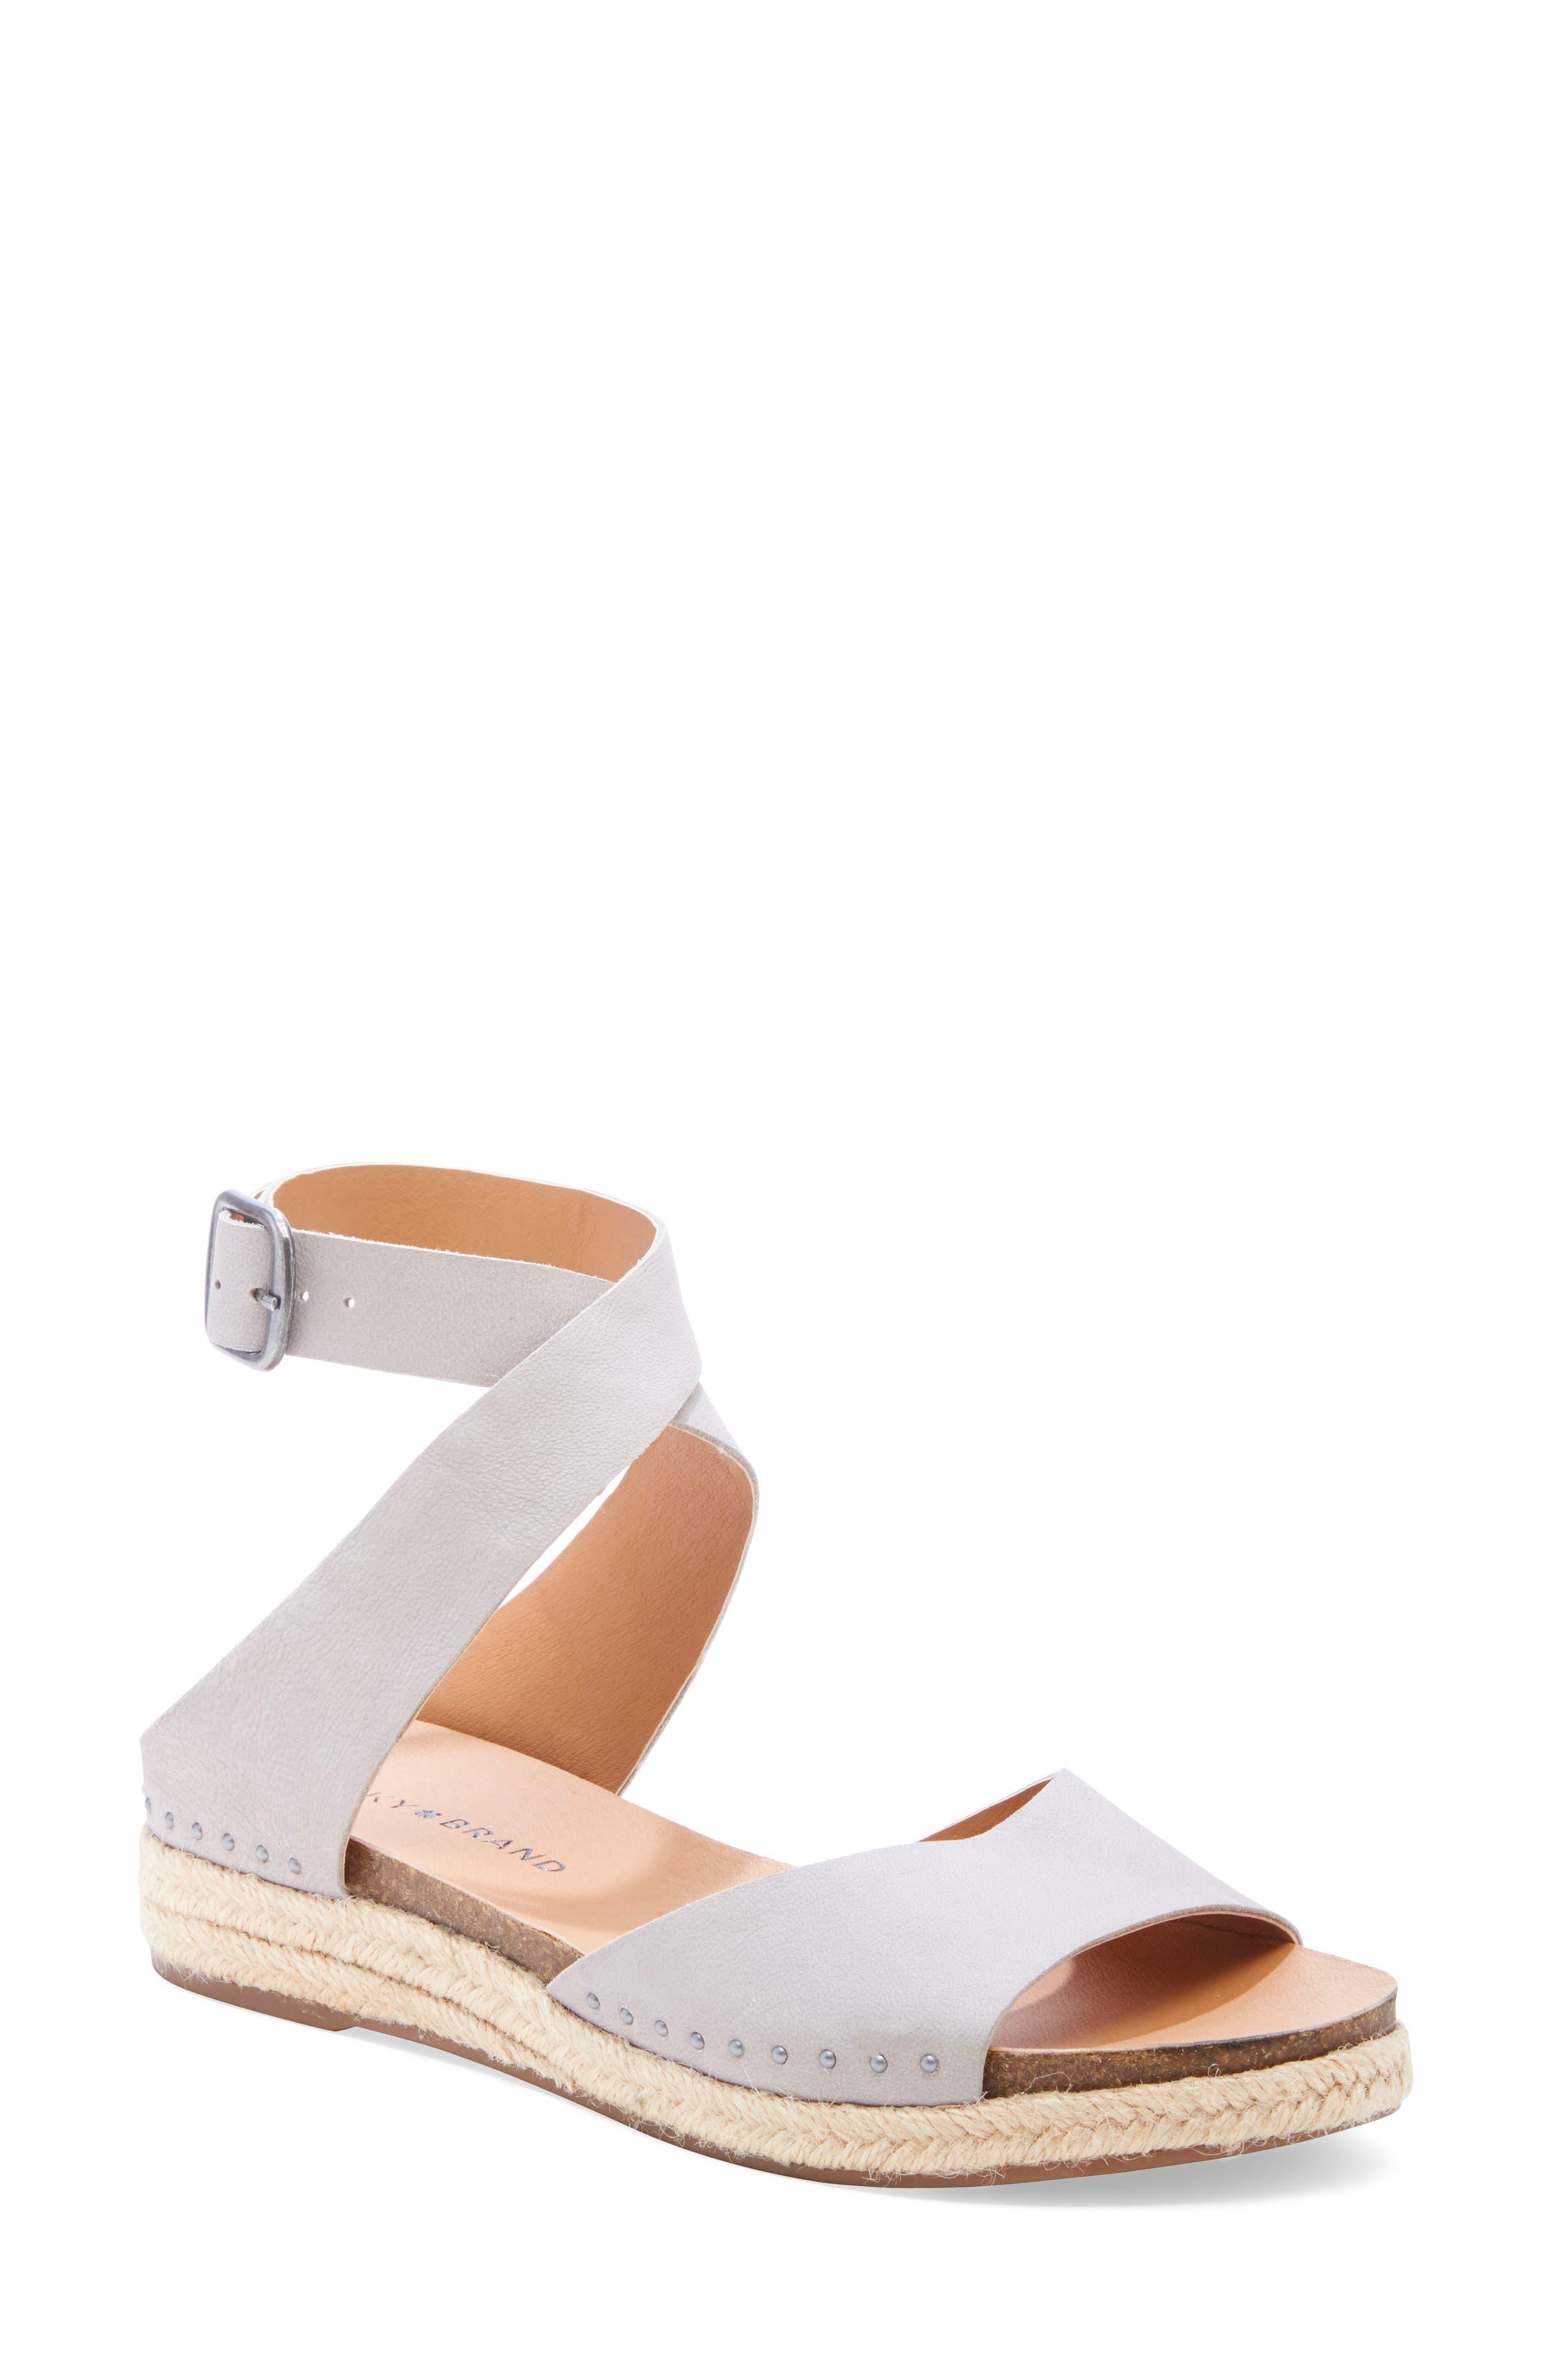 Gladas Wedge Espadrille Sandal, Main, color, CHINCHILLA LEATHER